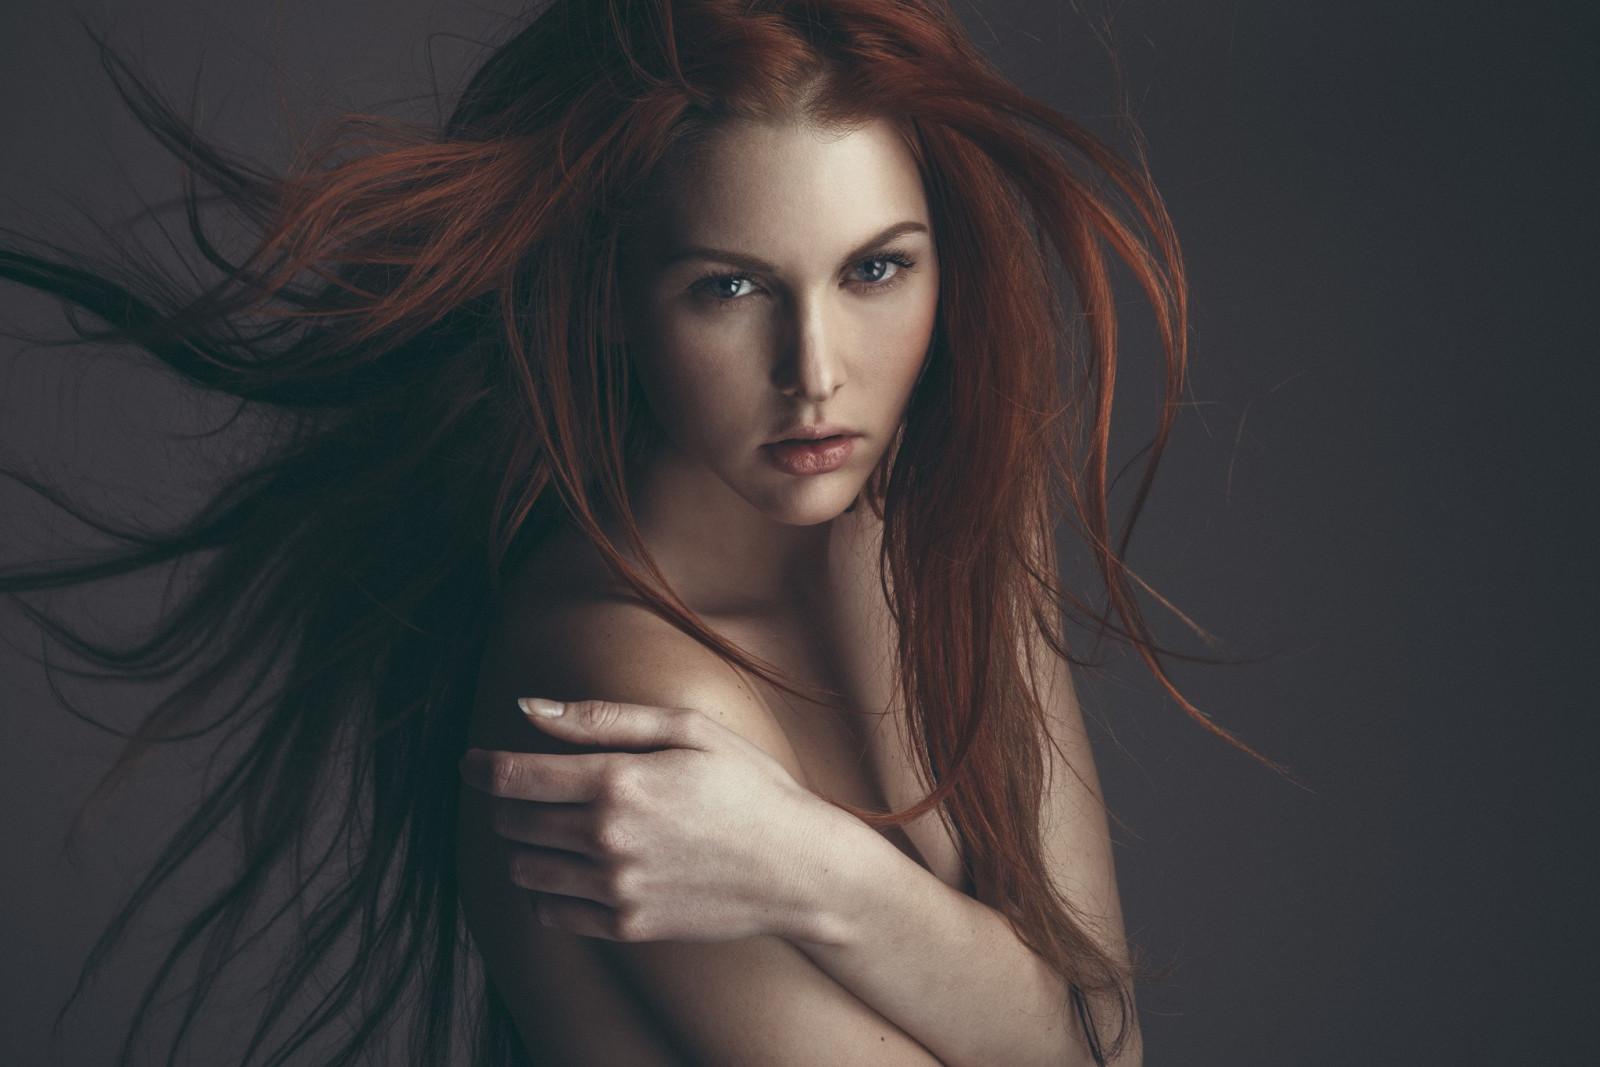 hintergrundbilder : frau, rothaarige, modell-, porträt